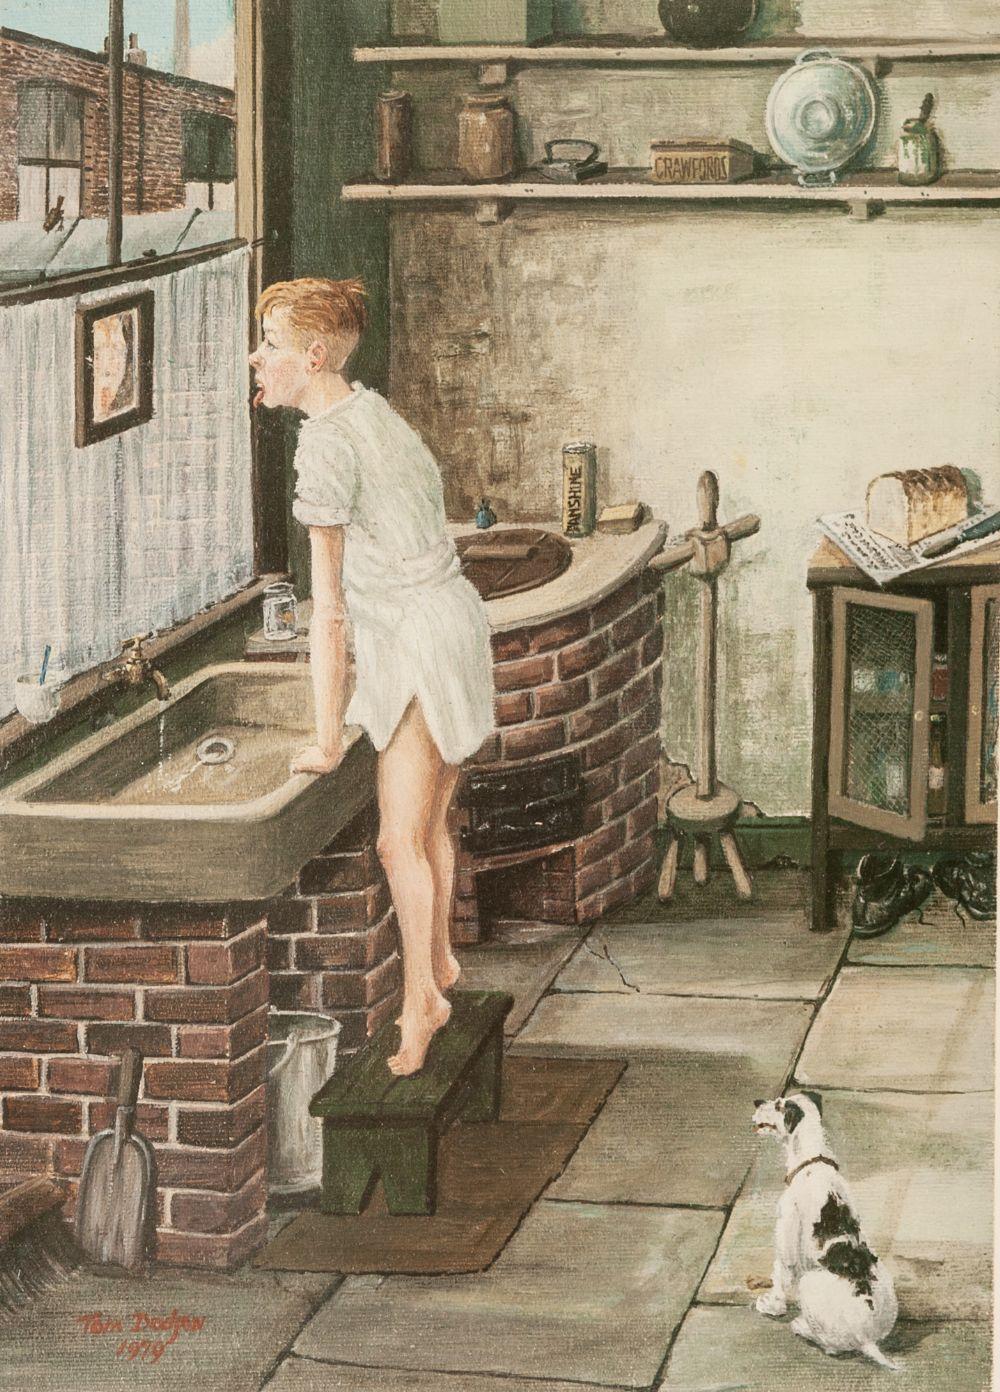 TOM DODSON (1910 - 1991) ARTIST SIGNED COLOUR PRINT 'Boy at kitchen sink' Blind stamped and signed